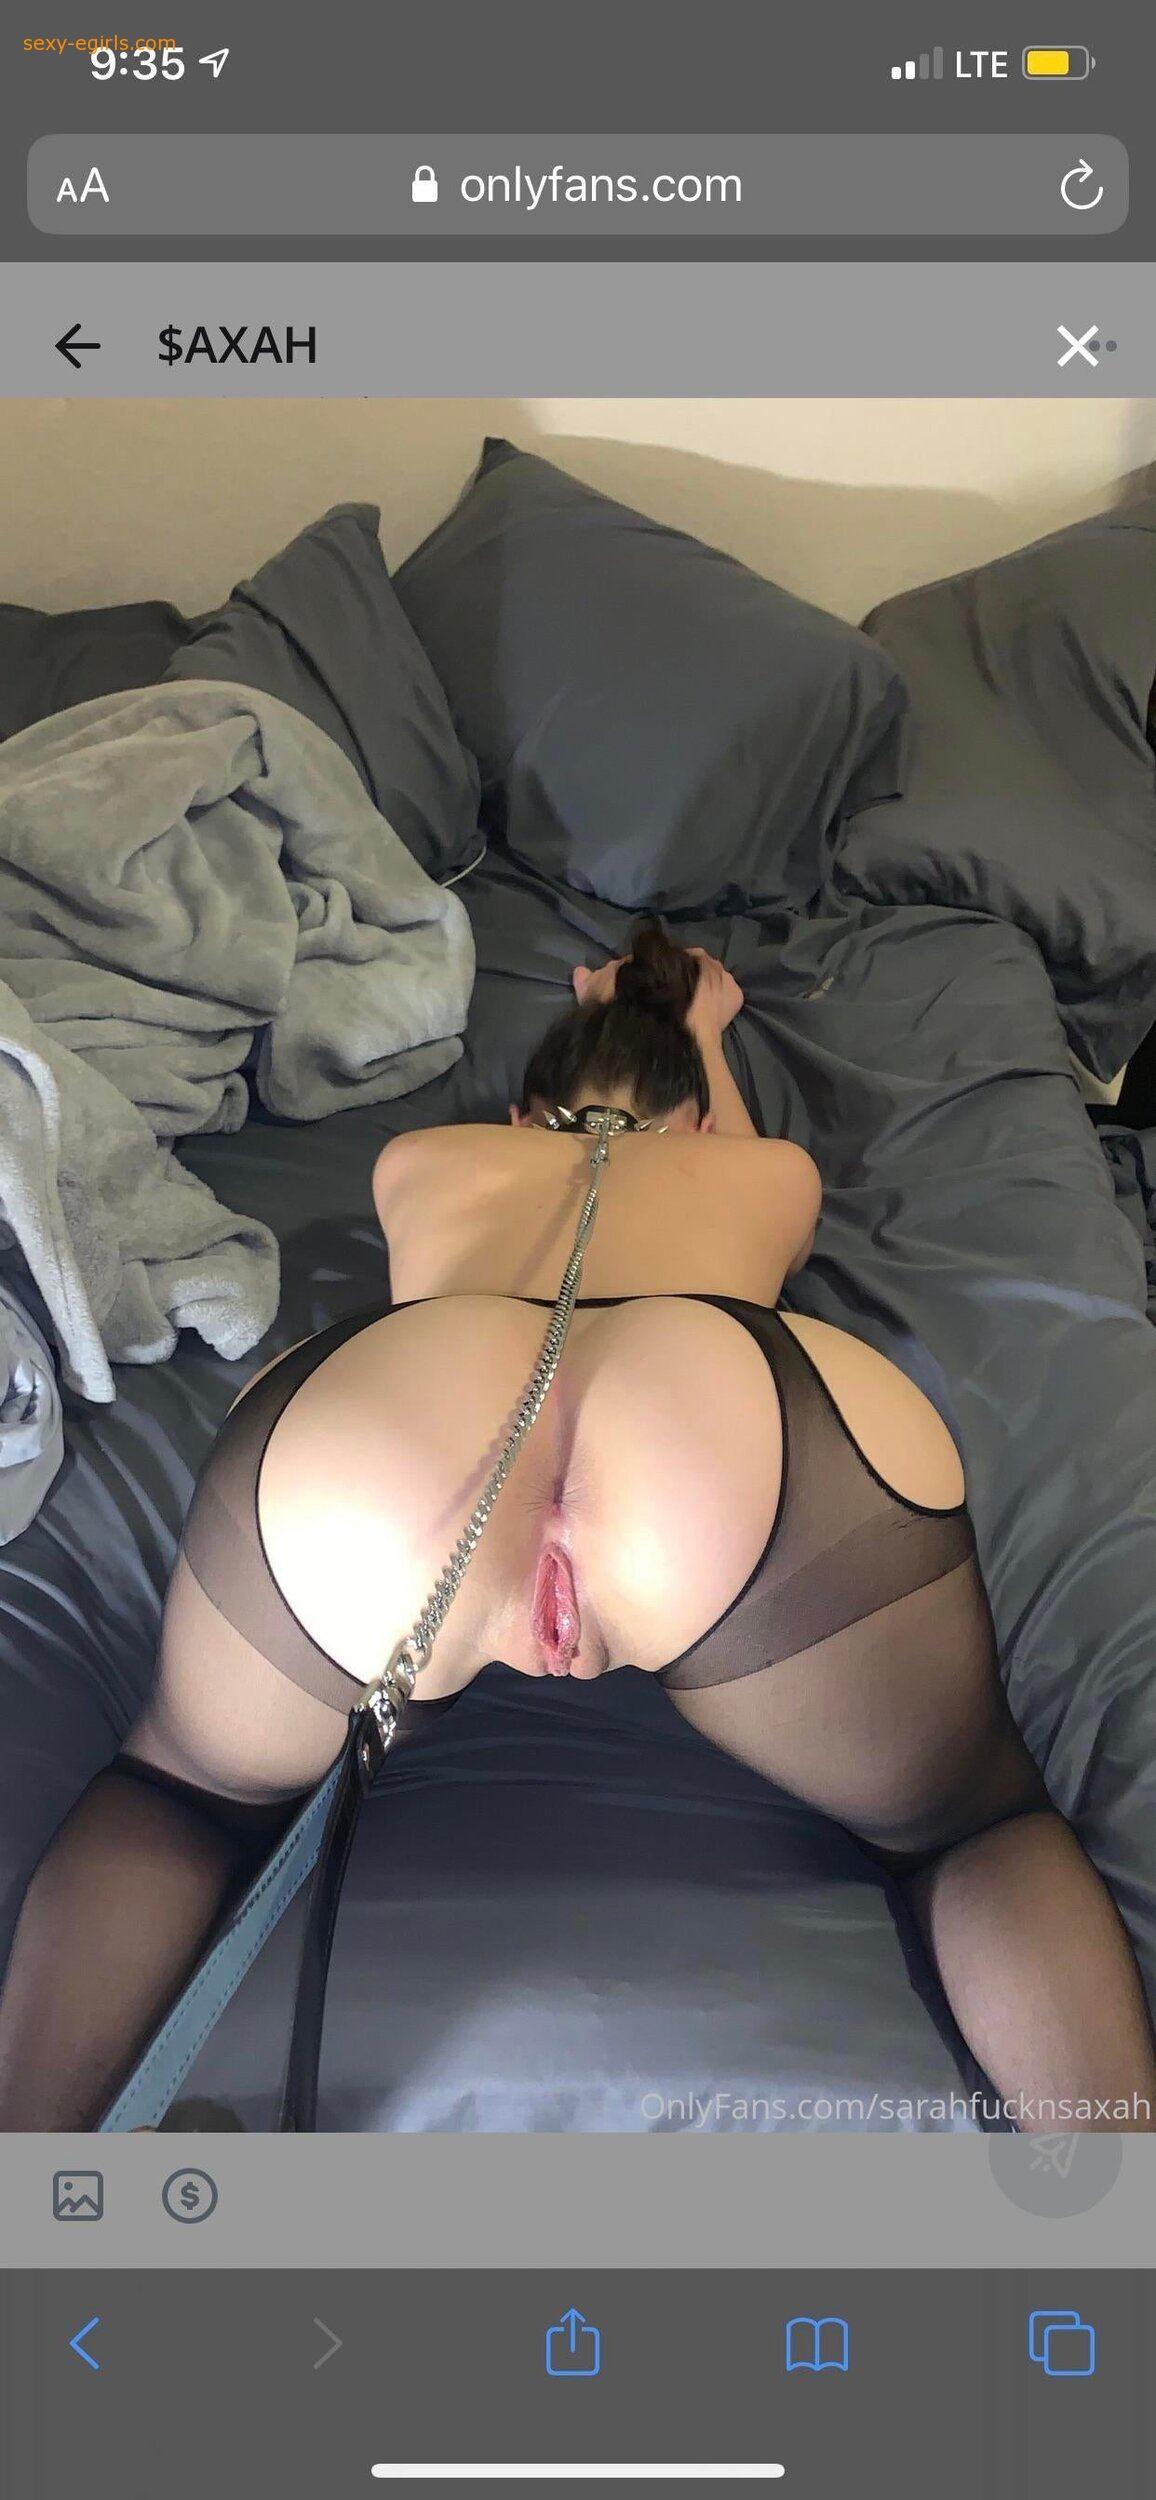 Sarahfucknsaxah Onlyfans Nudes Leaks (0009